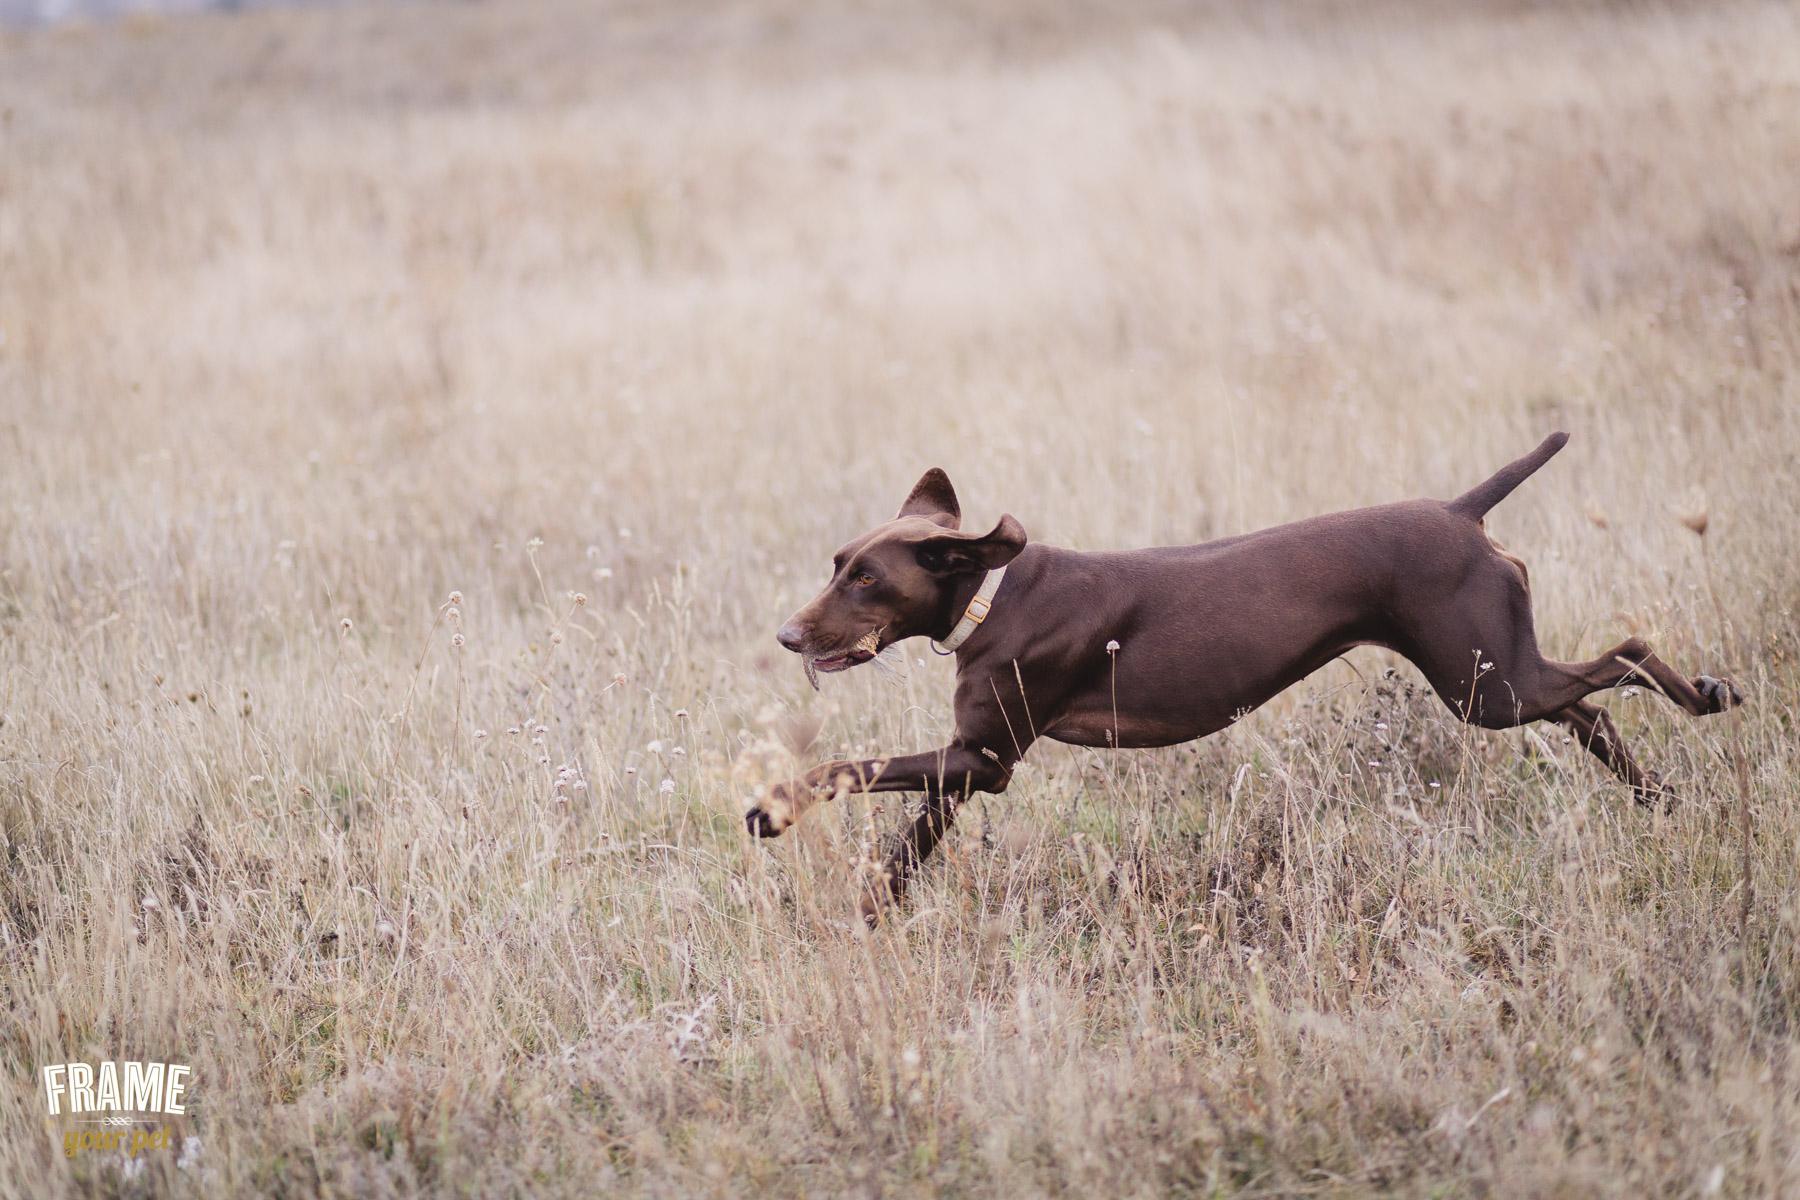 hunter-dog-in-action